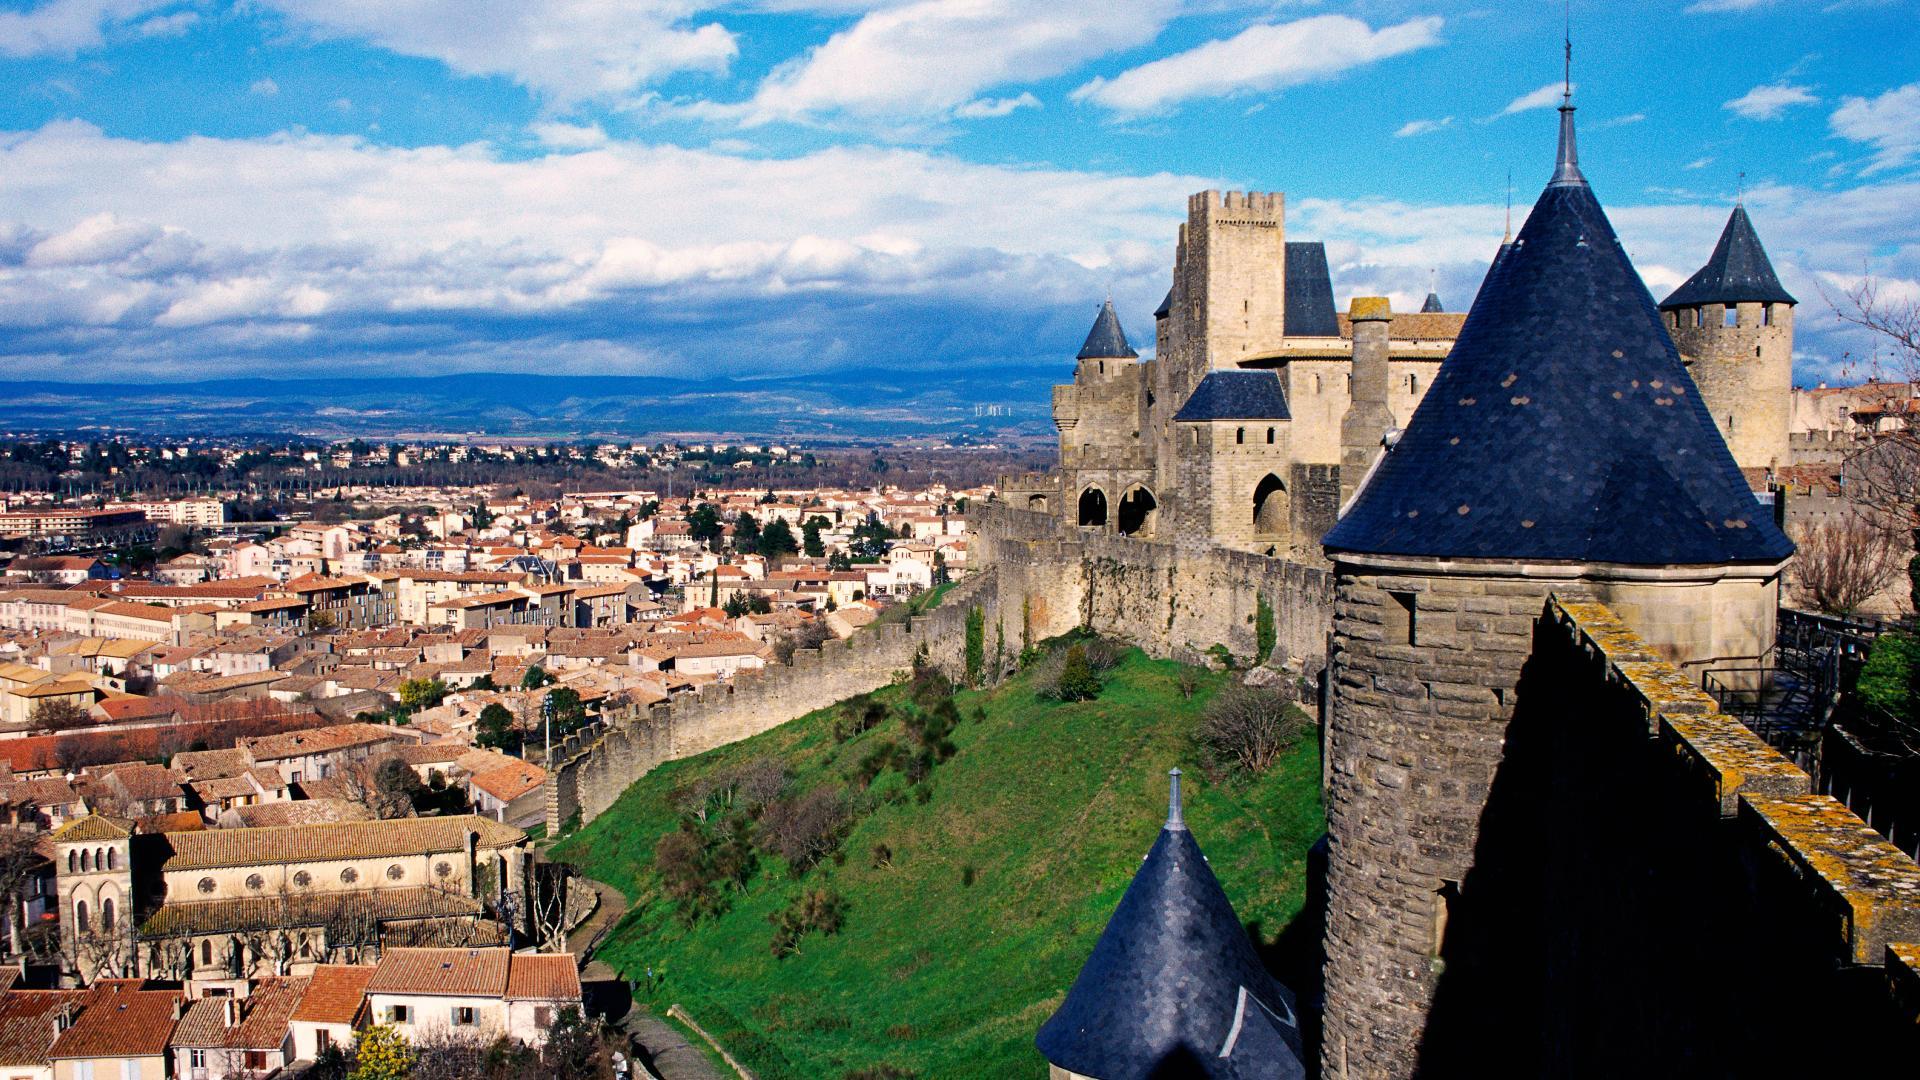 Muralhas em Carcassonne